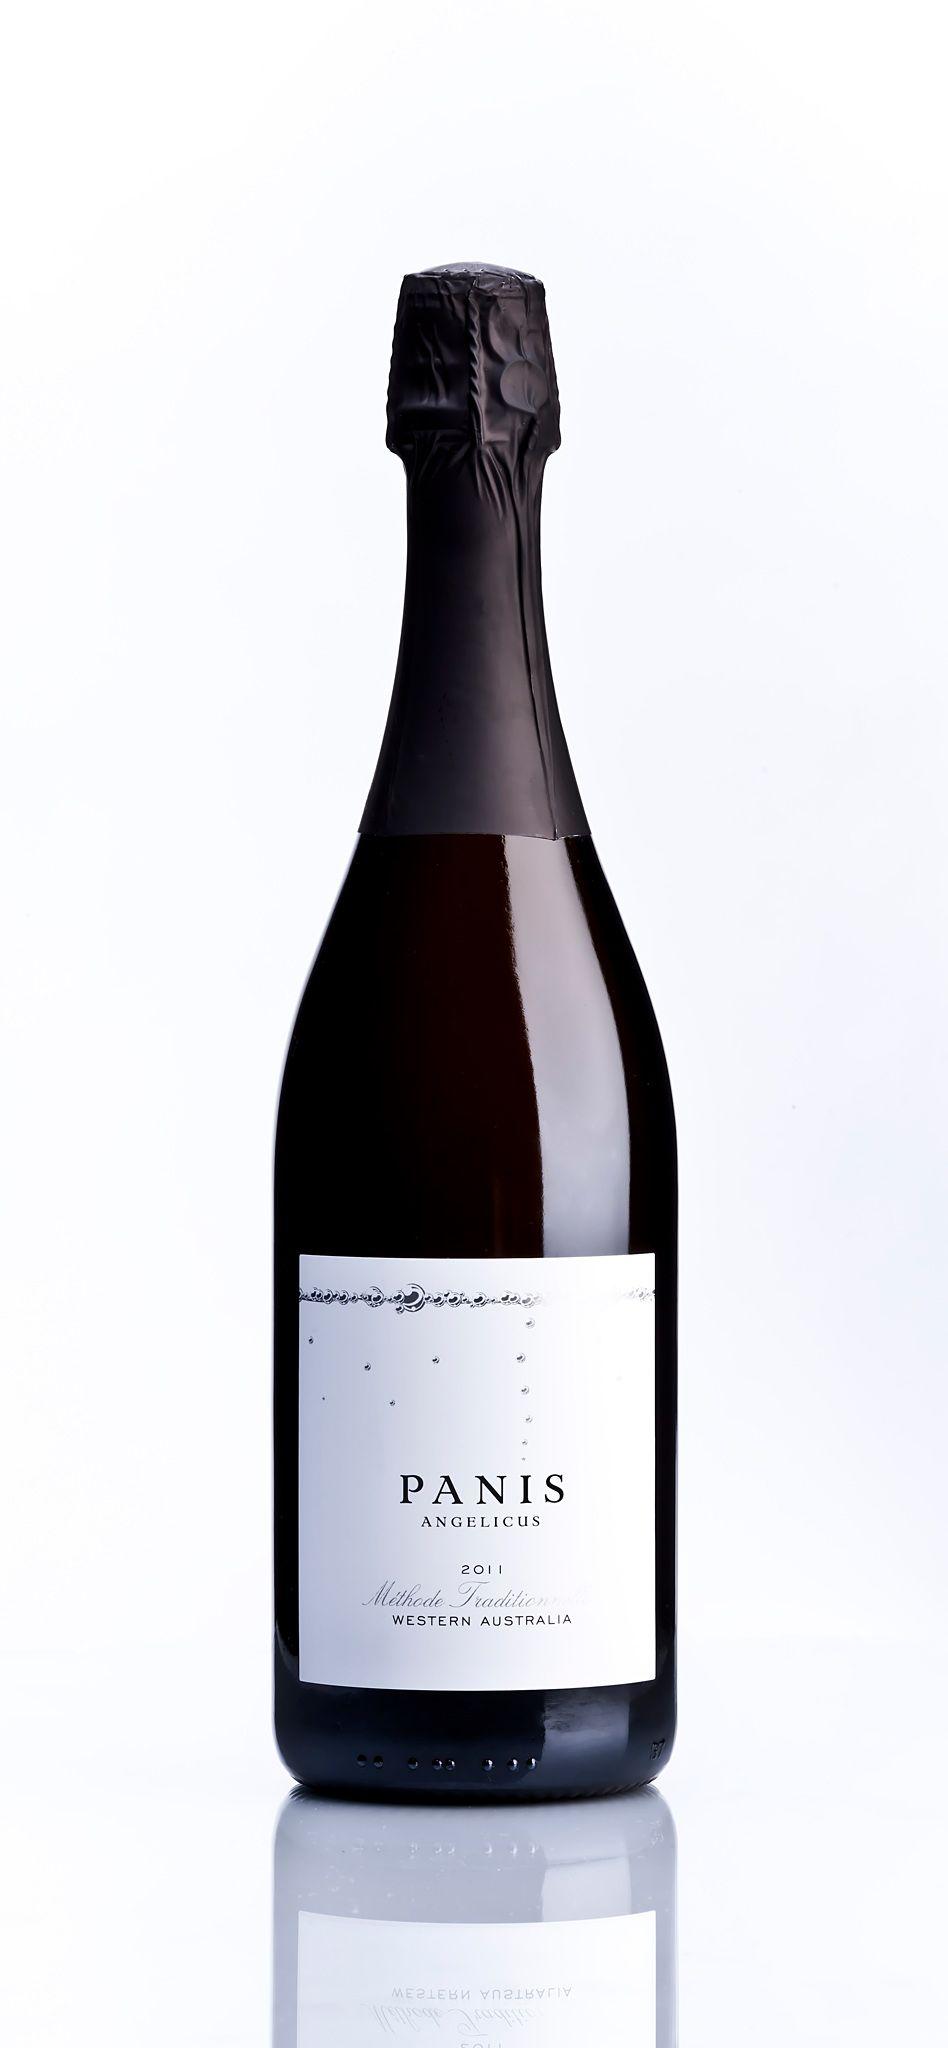 Panis_Wh.jpg